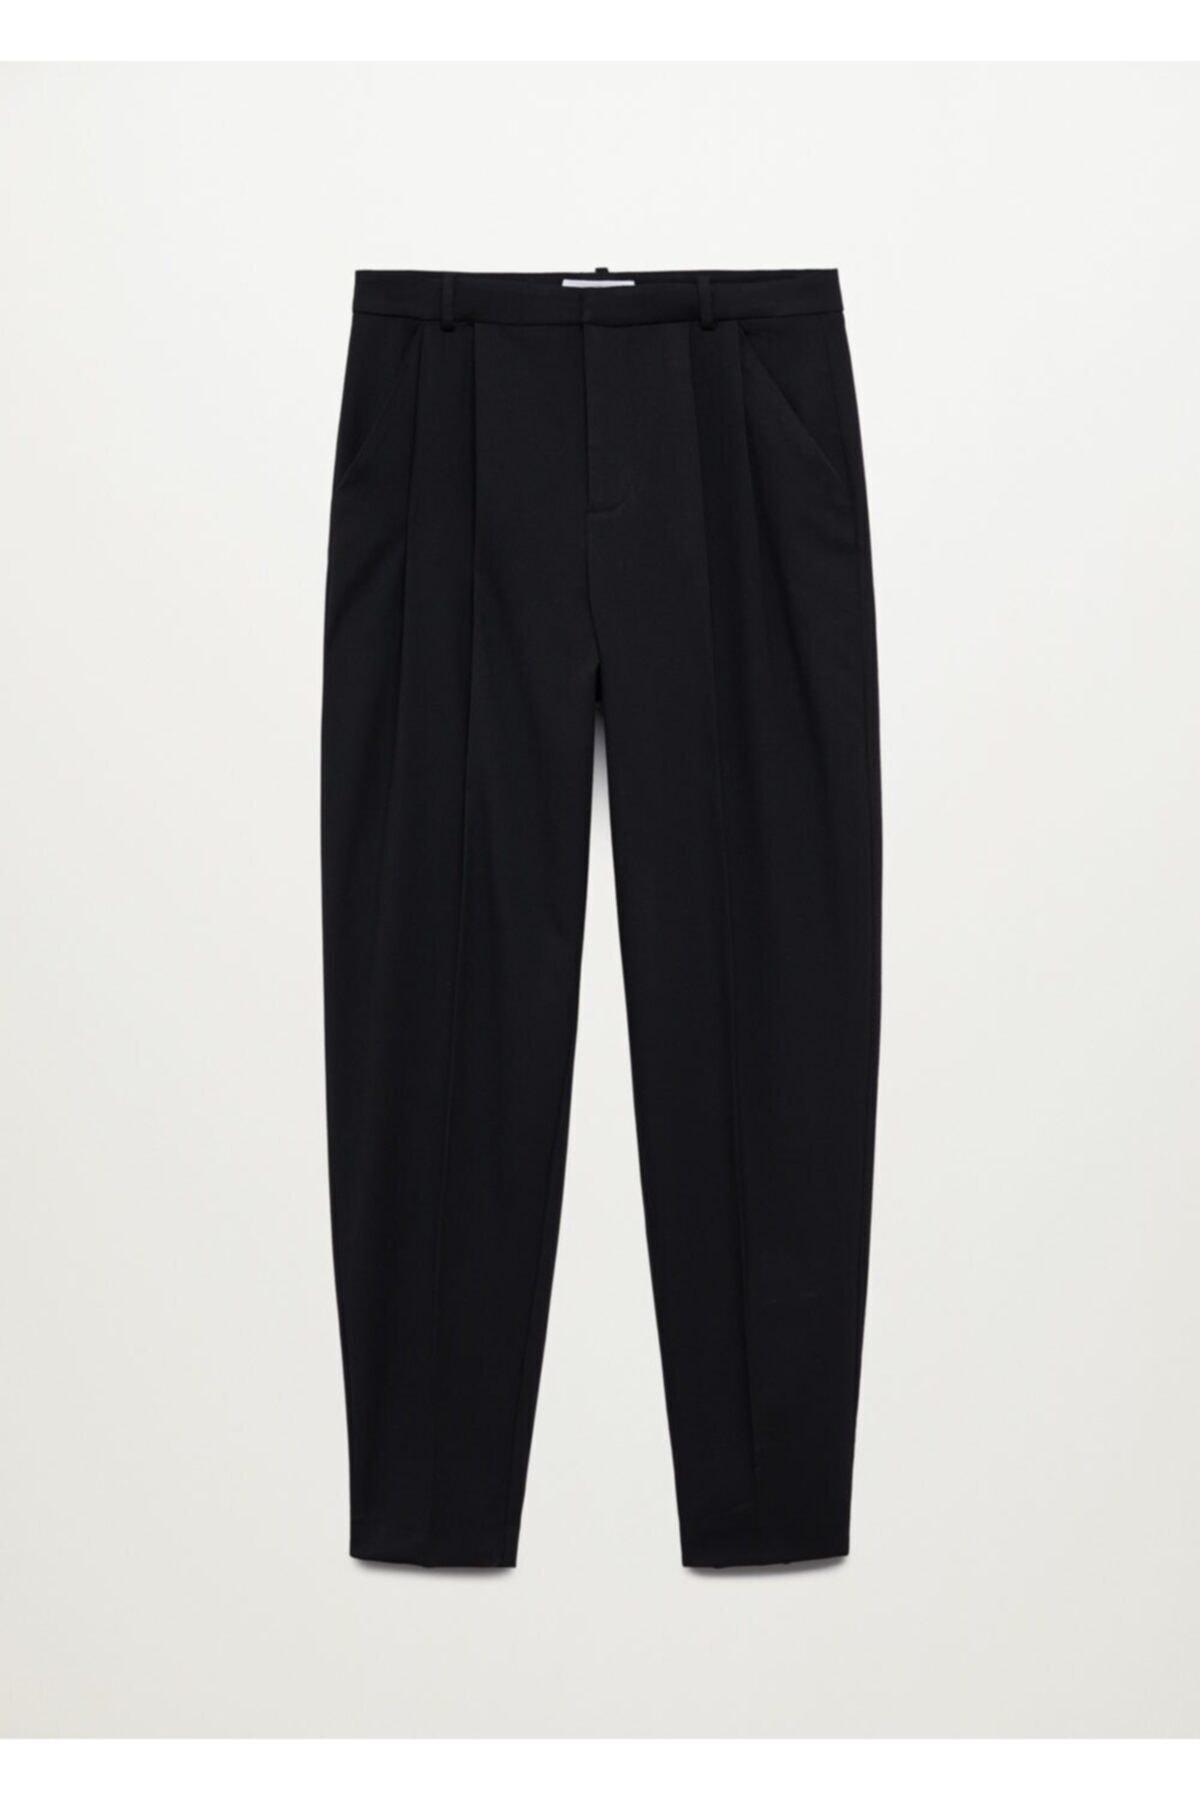 MANGO Woman Kadın Siyah Cepli Pantolon 1